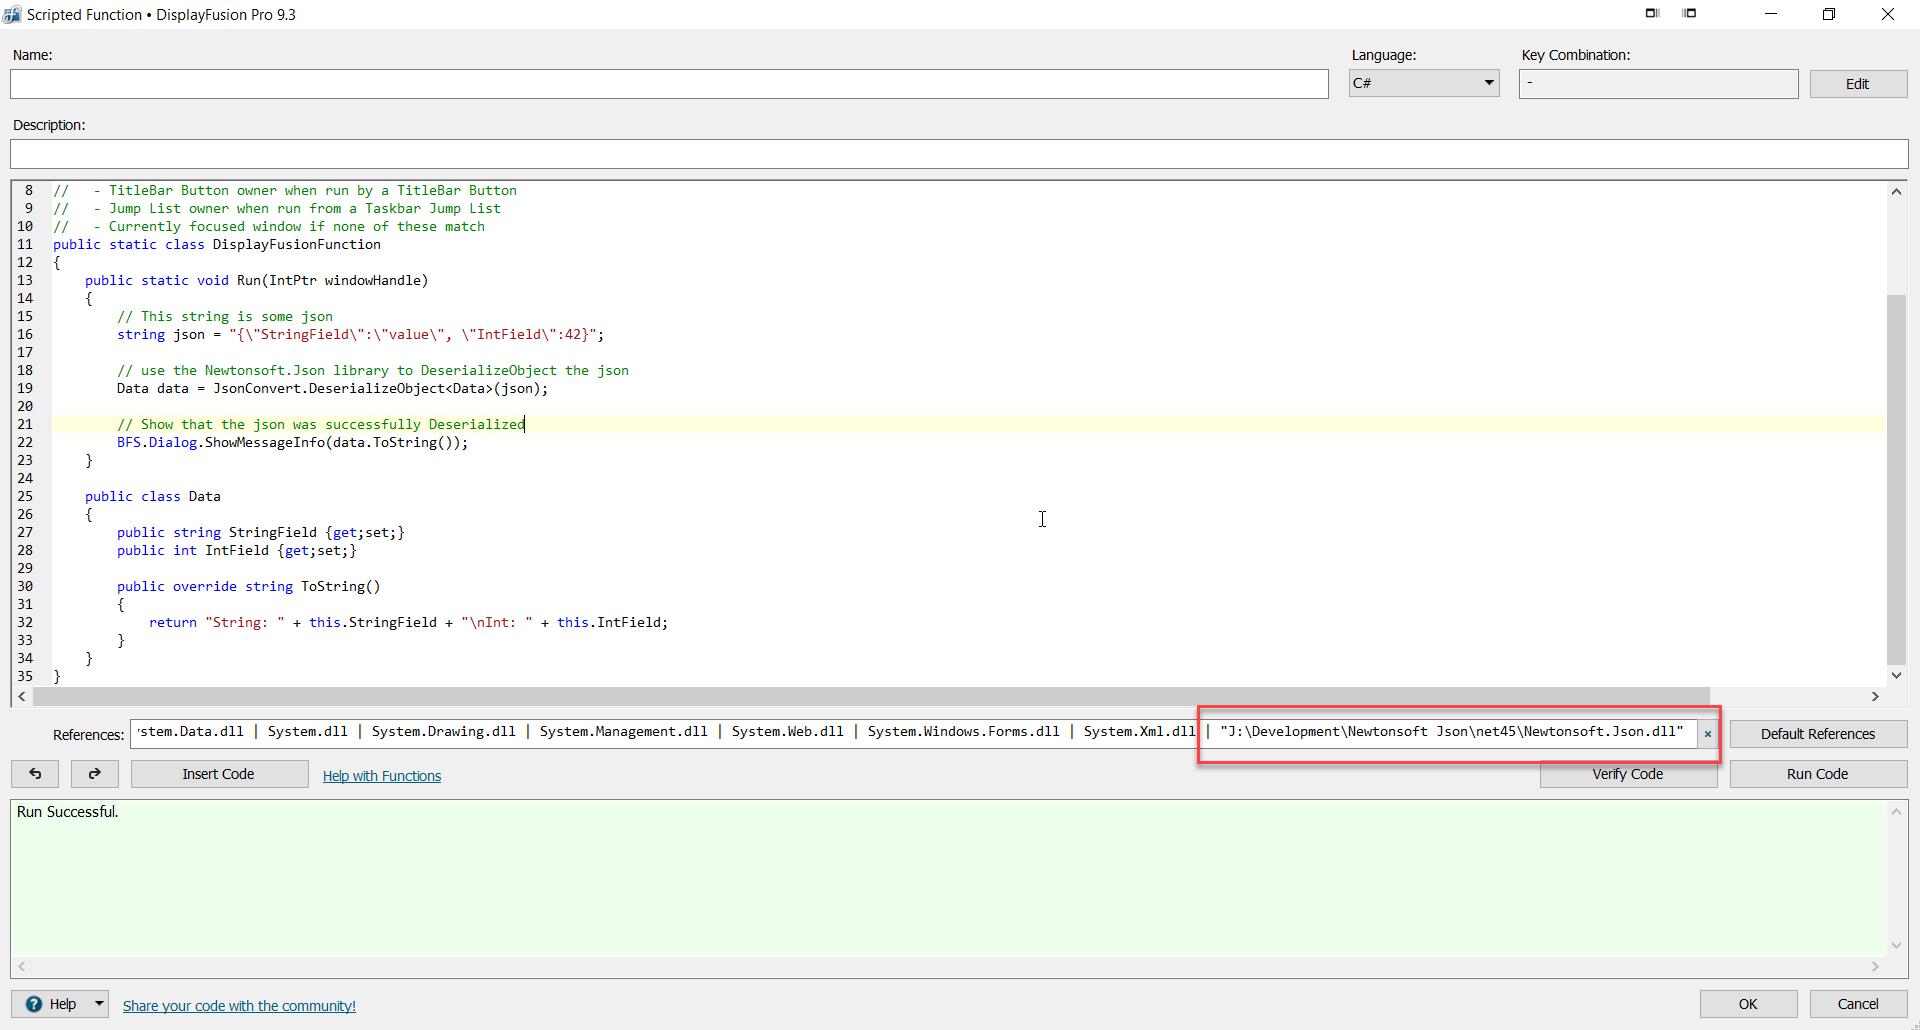 df-script-referneces-field.png